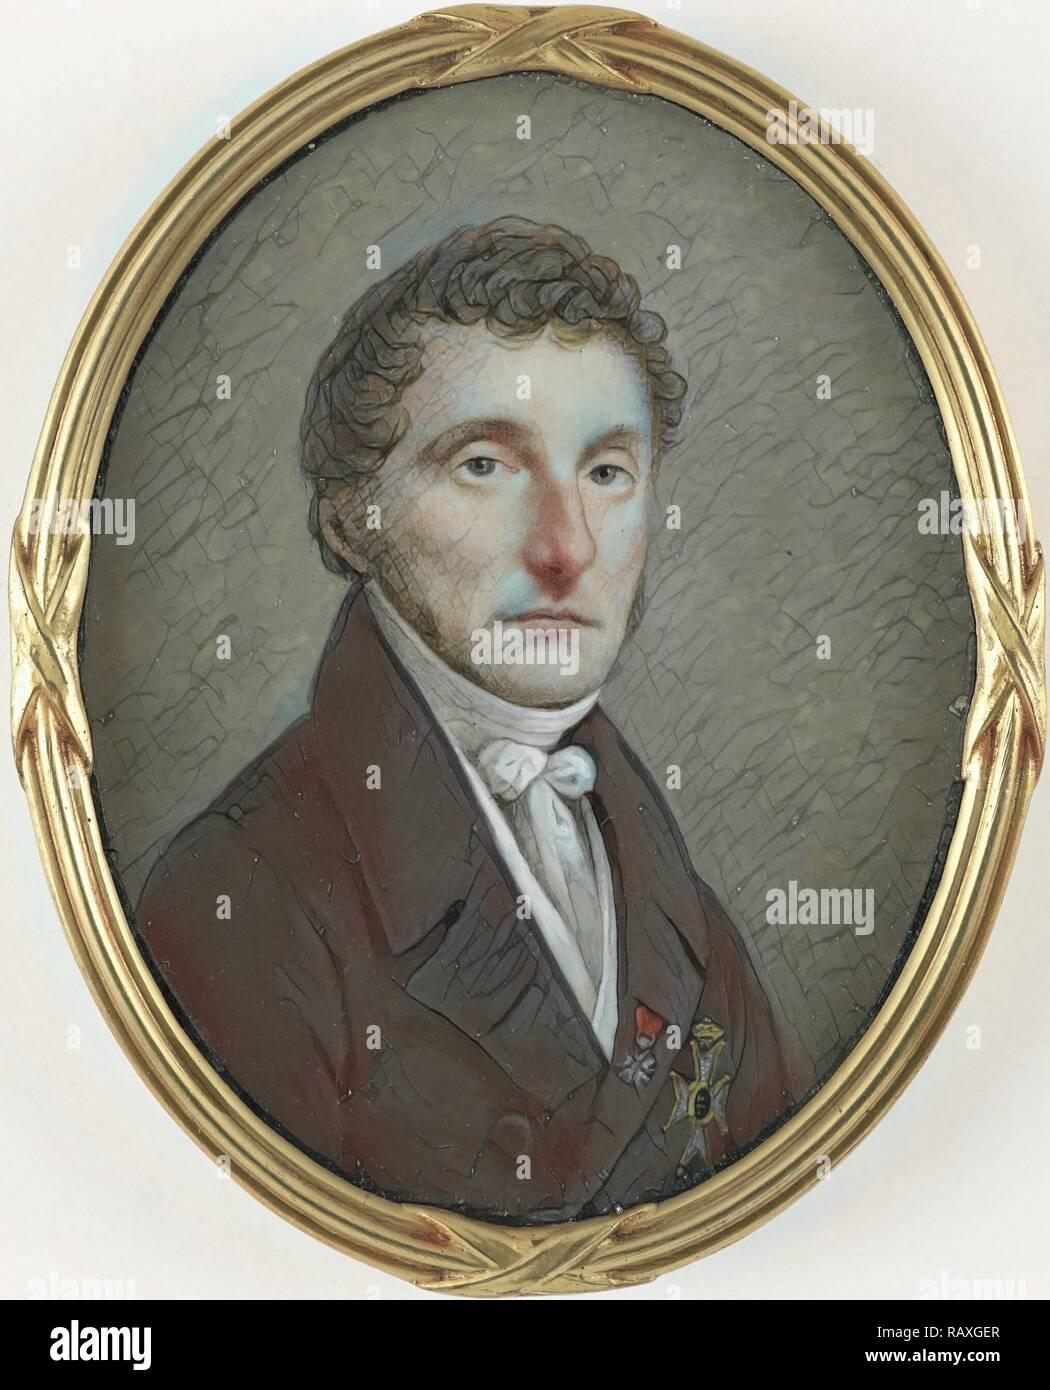 Pieter de Riemer (1769-1831). Profesor de Obstetricia, cirujano consultor del rey Guillermo I, Johannes Hari (I), 1800 reinventado Imagen De Stock